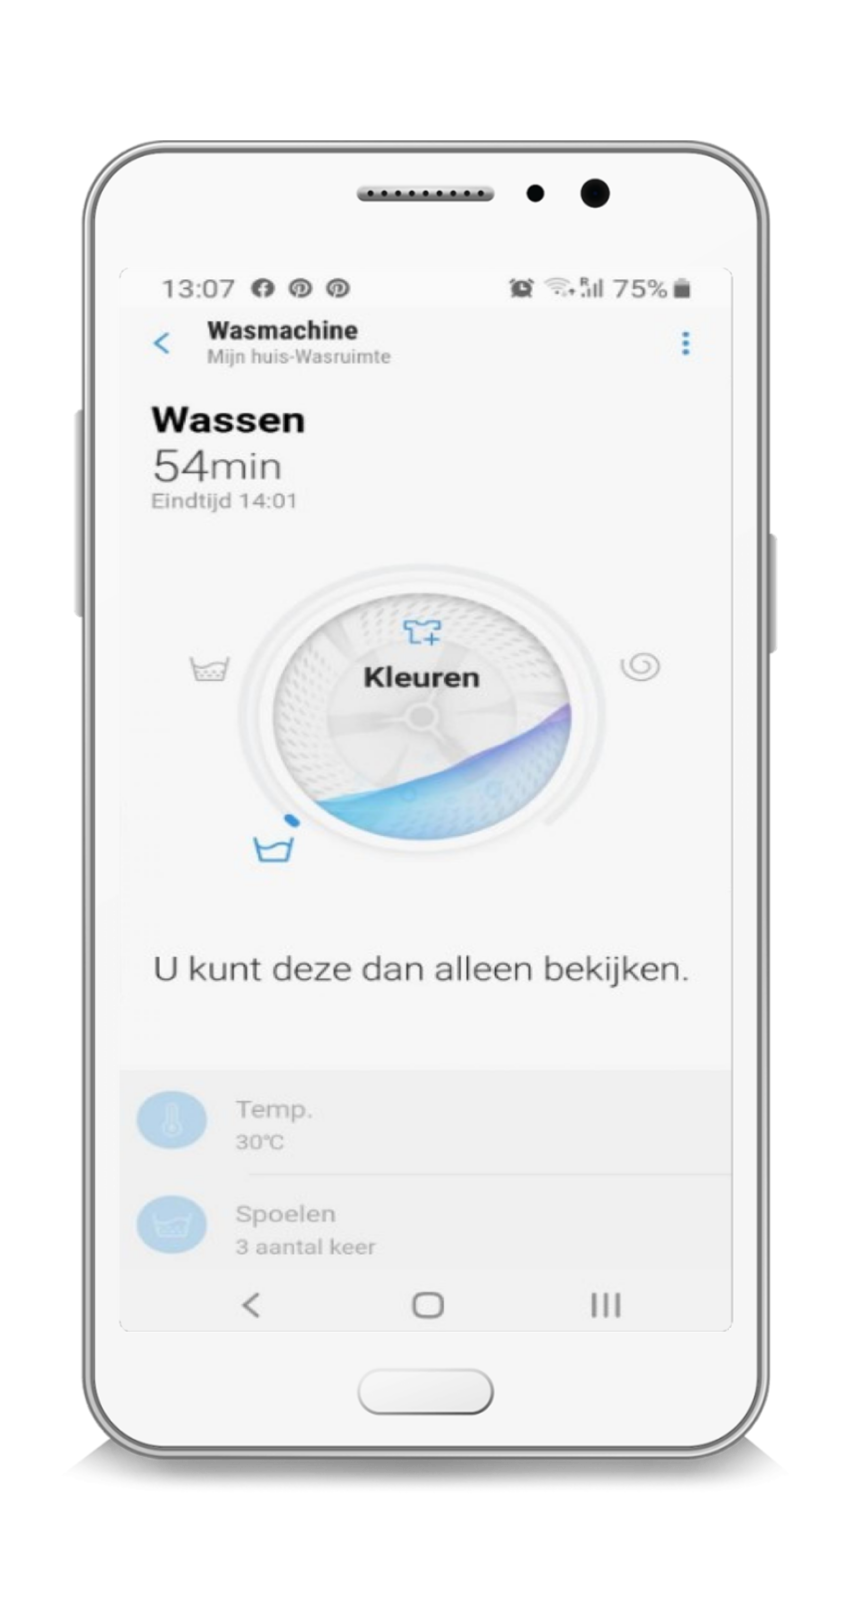 REVIEW Samsung Quickdrive™ Wasmachine en Warmtepompdroger - REVIEW Samsung Quickdrive